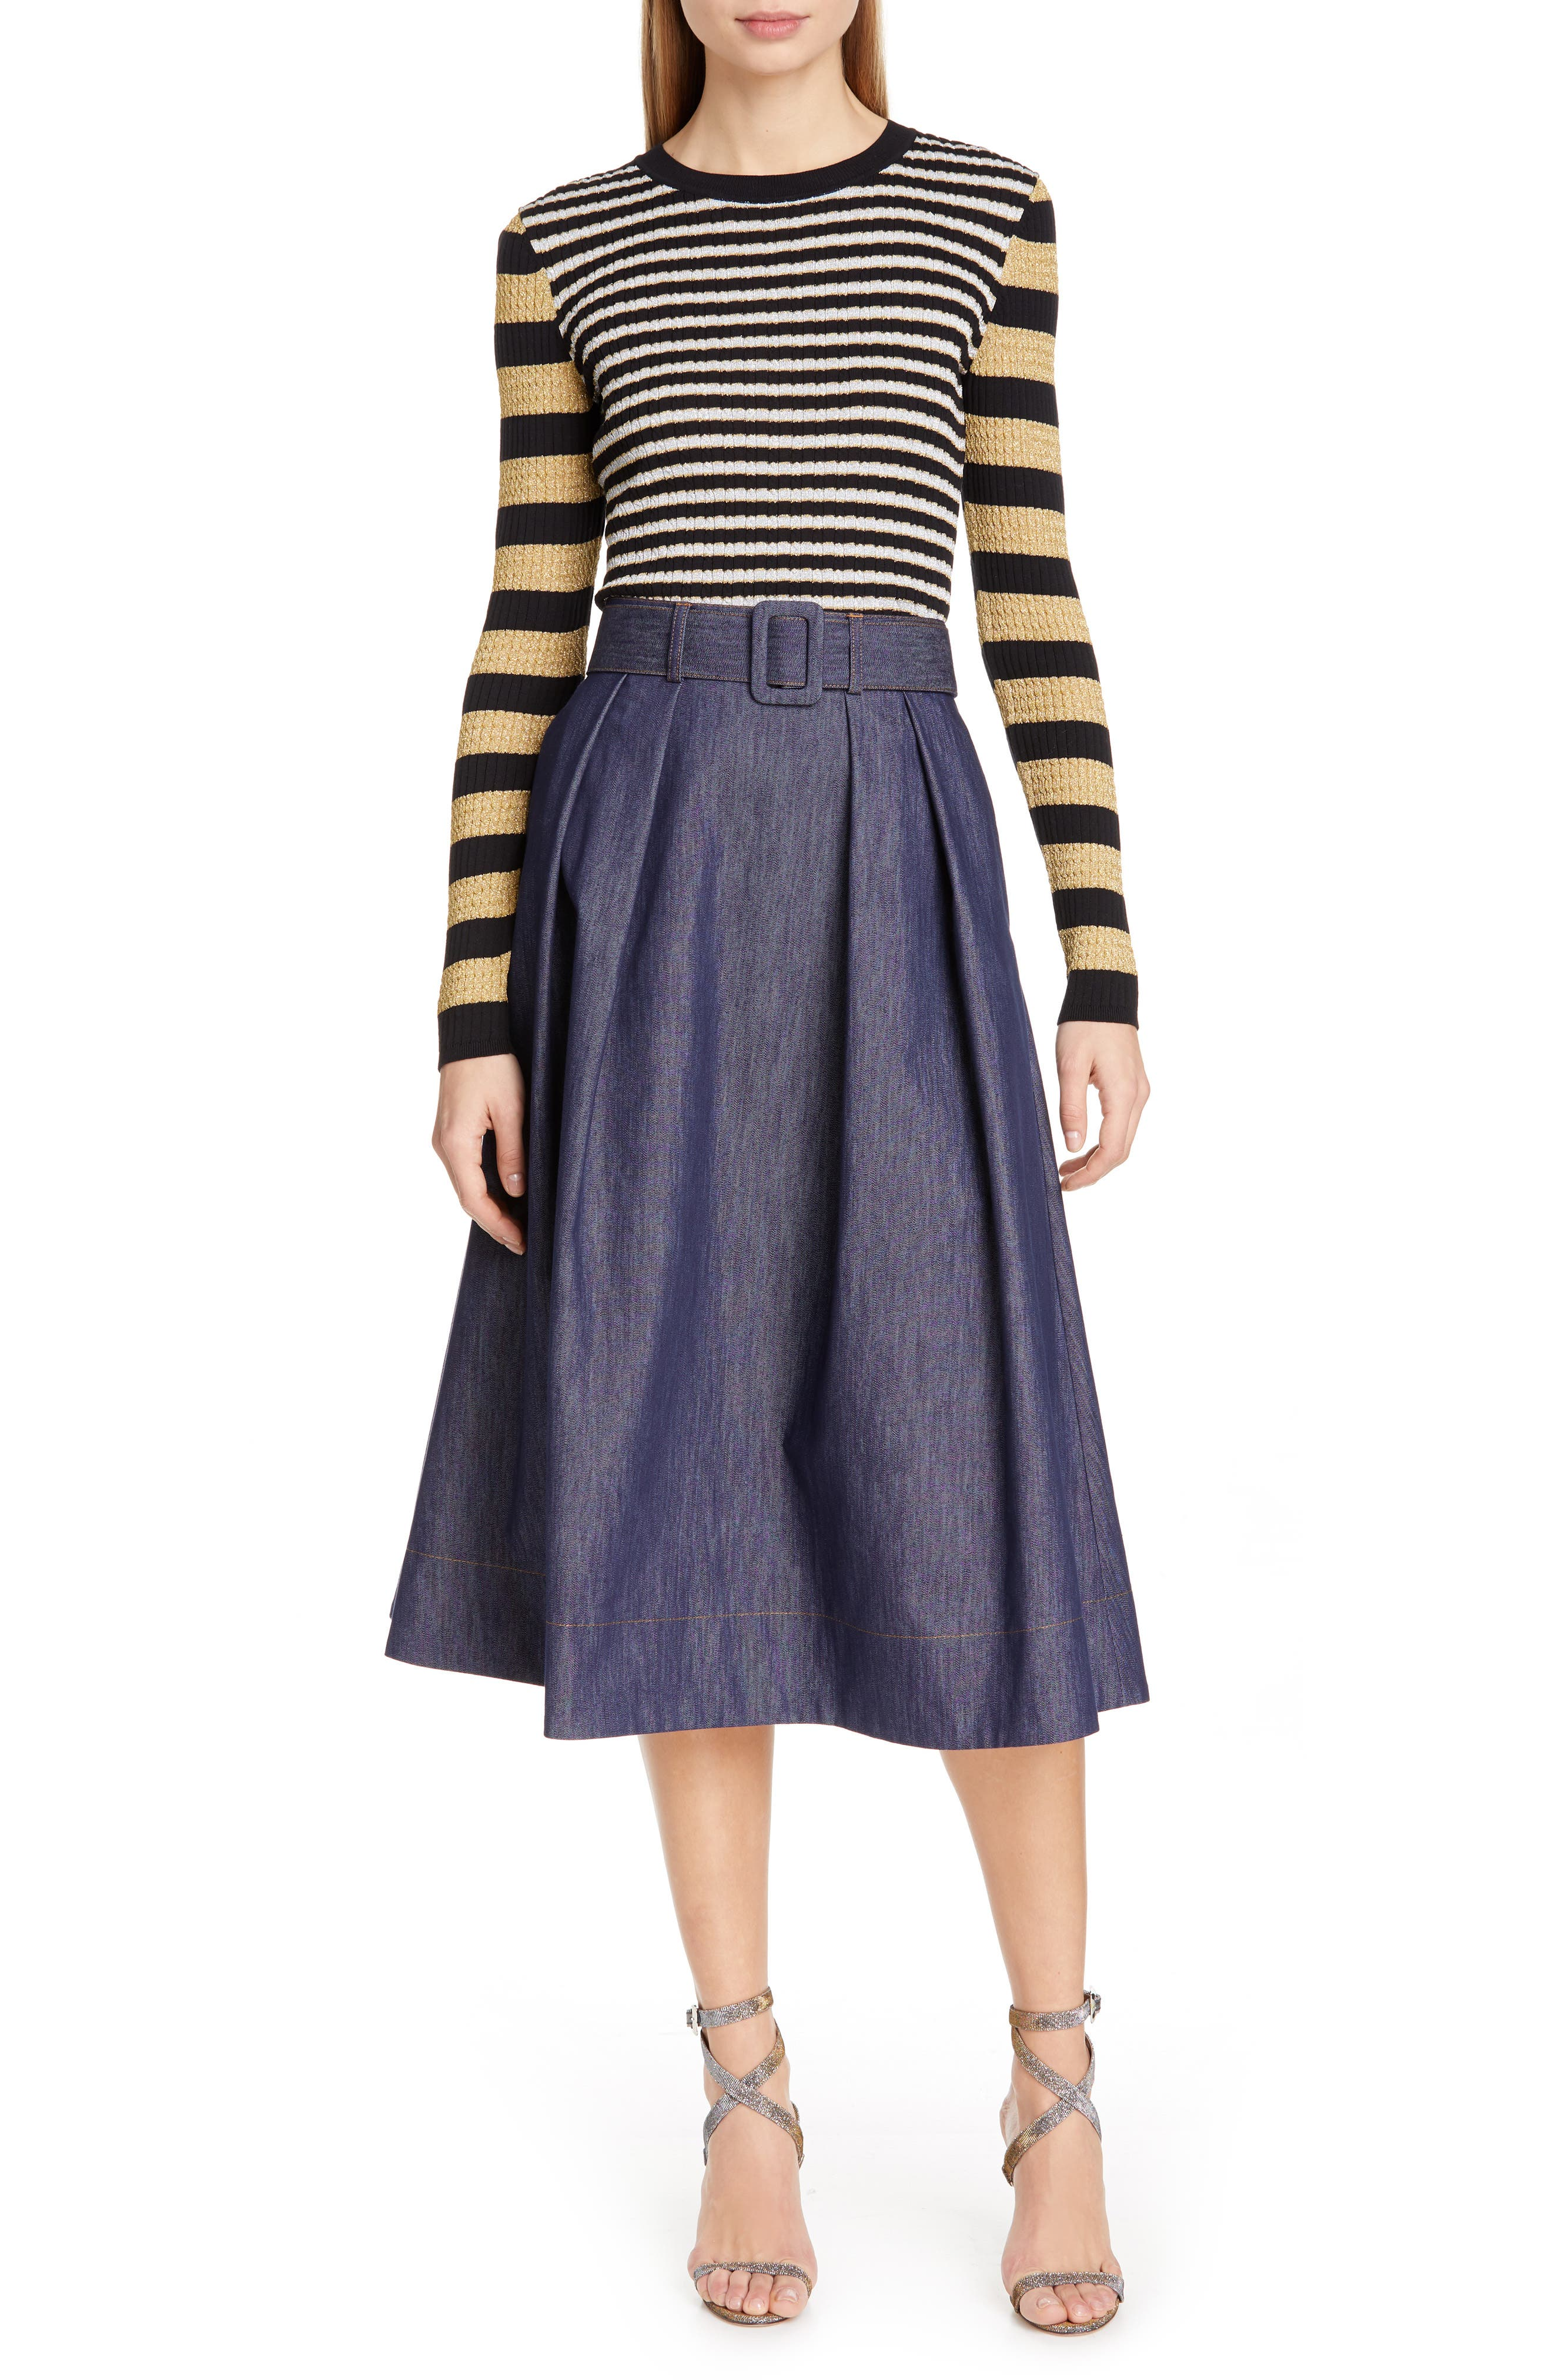 TOMMY X ZENDAYA, Metallic Stripe Knit Top, Alternate thumbnail 7, color, BLACK BEAUTY MULTI